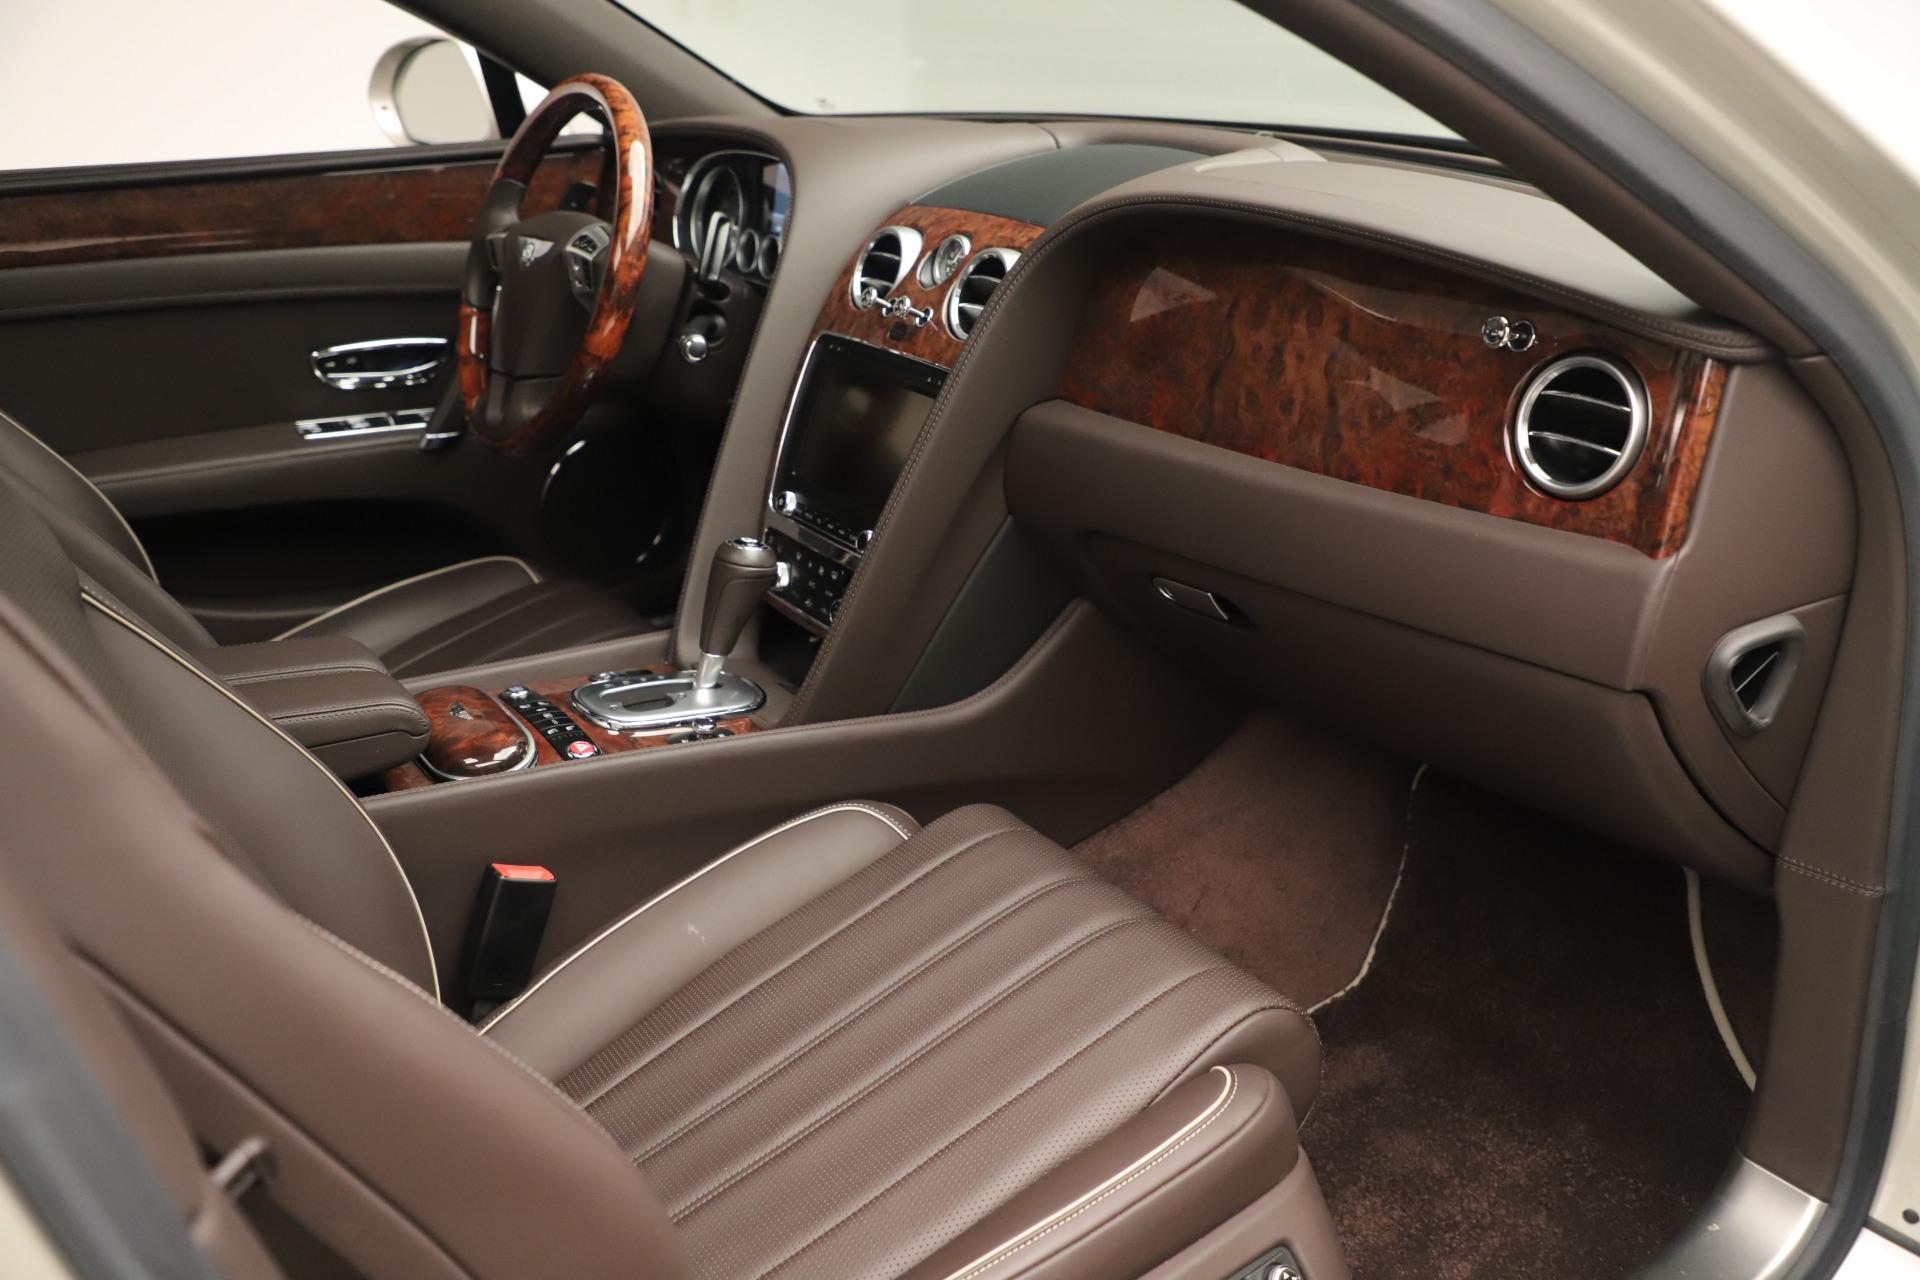 Used 2015 Bentley Flying Spur V8 For Sale In Westport, CT 3444_p24